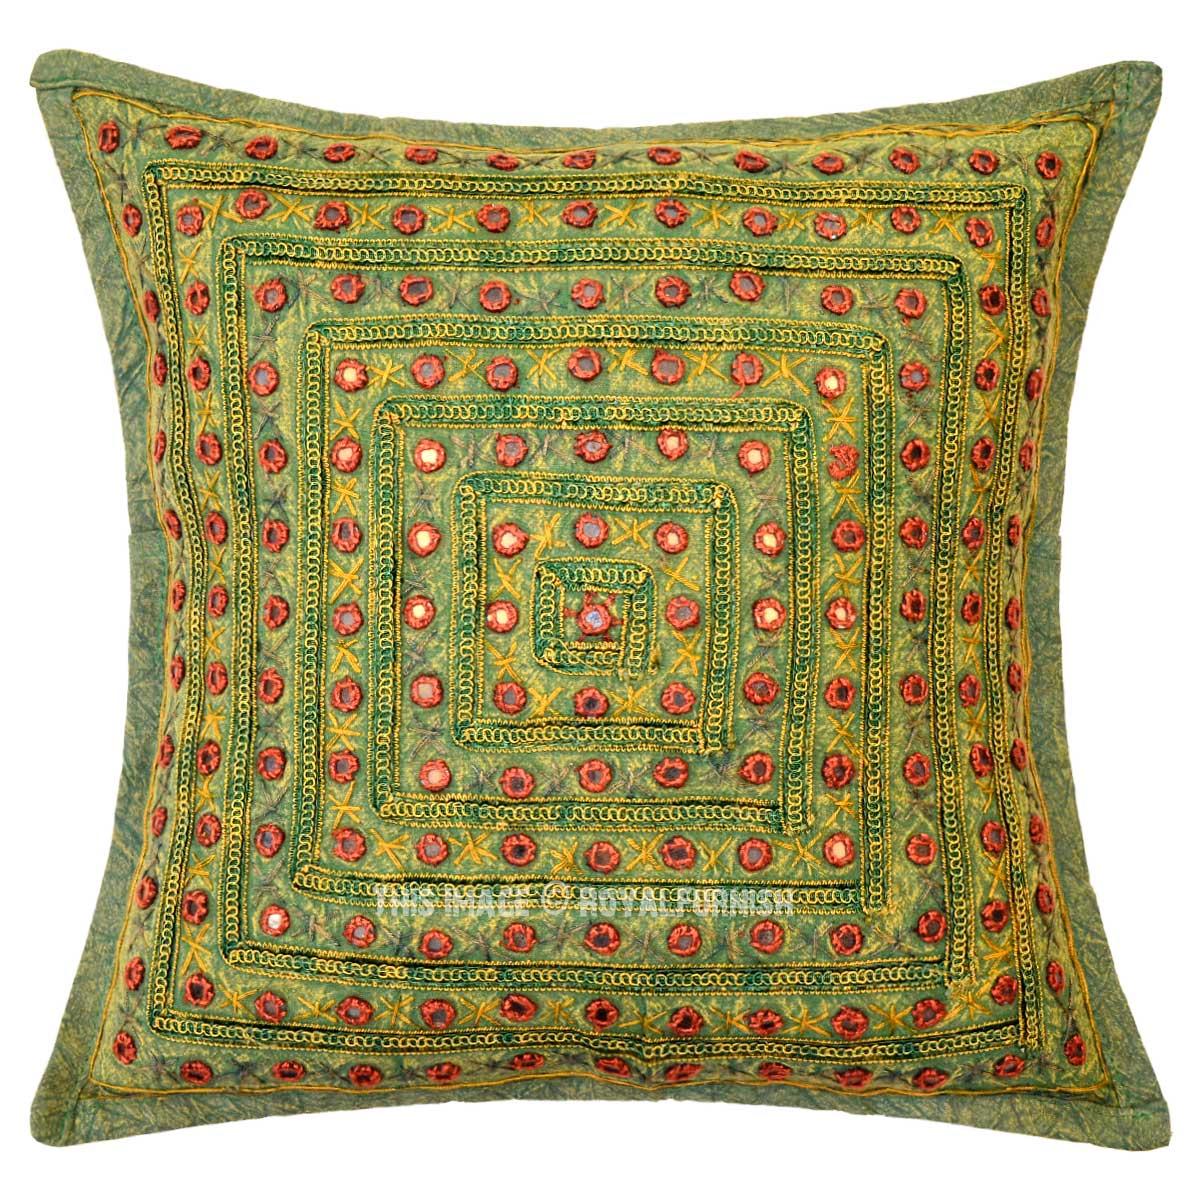 Multi Green Square Mirrored Embroidered Handmade Decorative Pillow Case 16X16 Inch ...